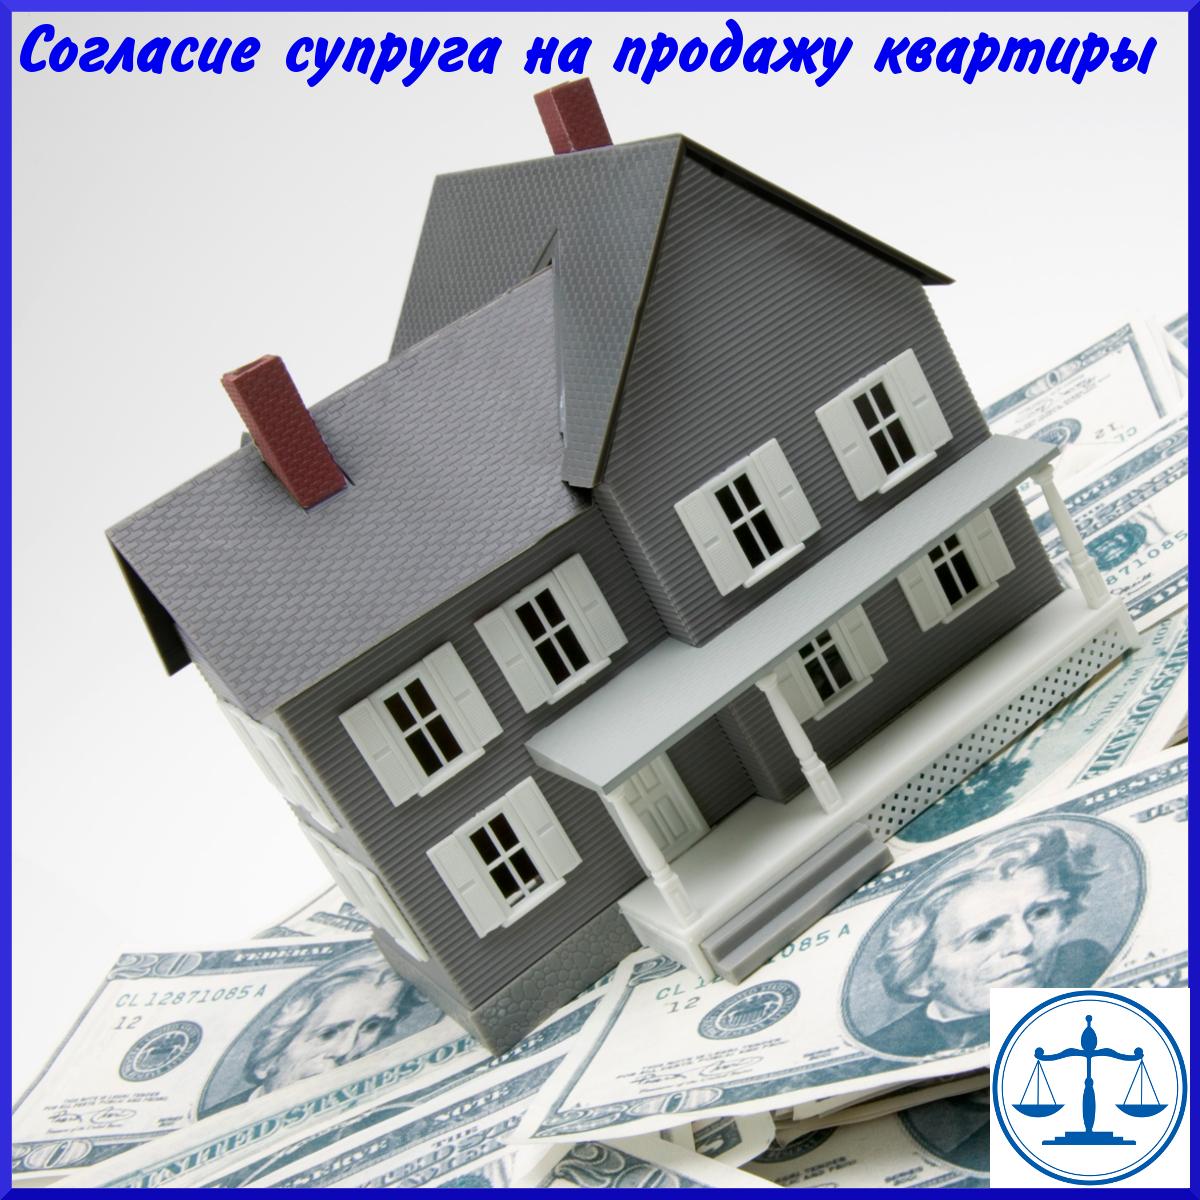 займ под залог недвижимости в симферополе